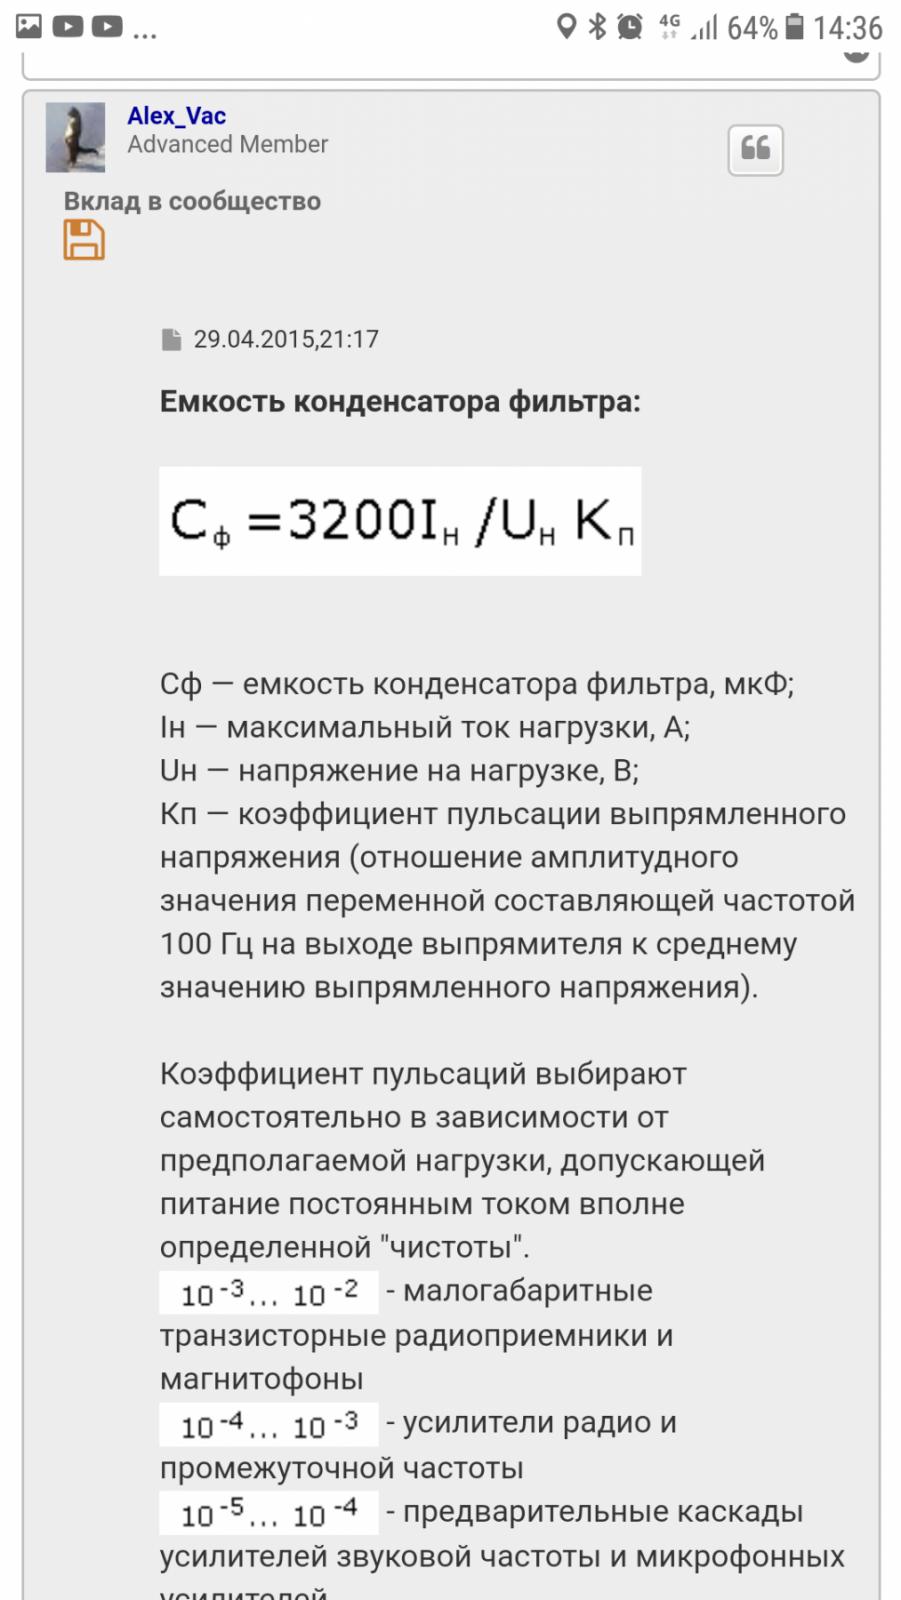 Screenshot_20200621-143612.thumb.png.8980c5b8fbcb1596933c924ab3749d99.png